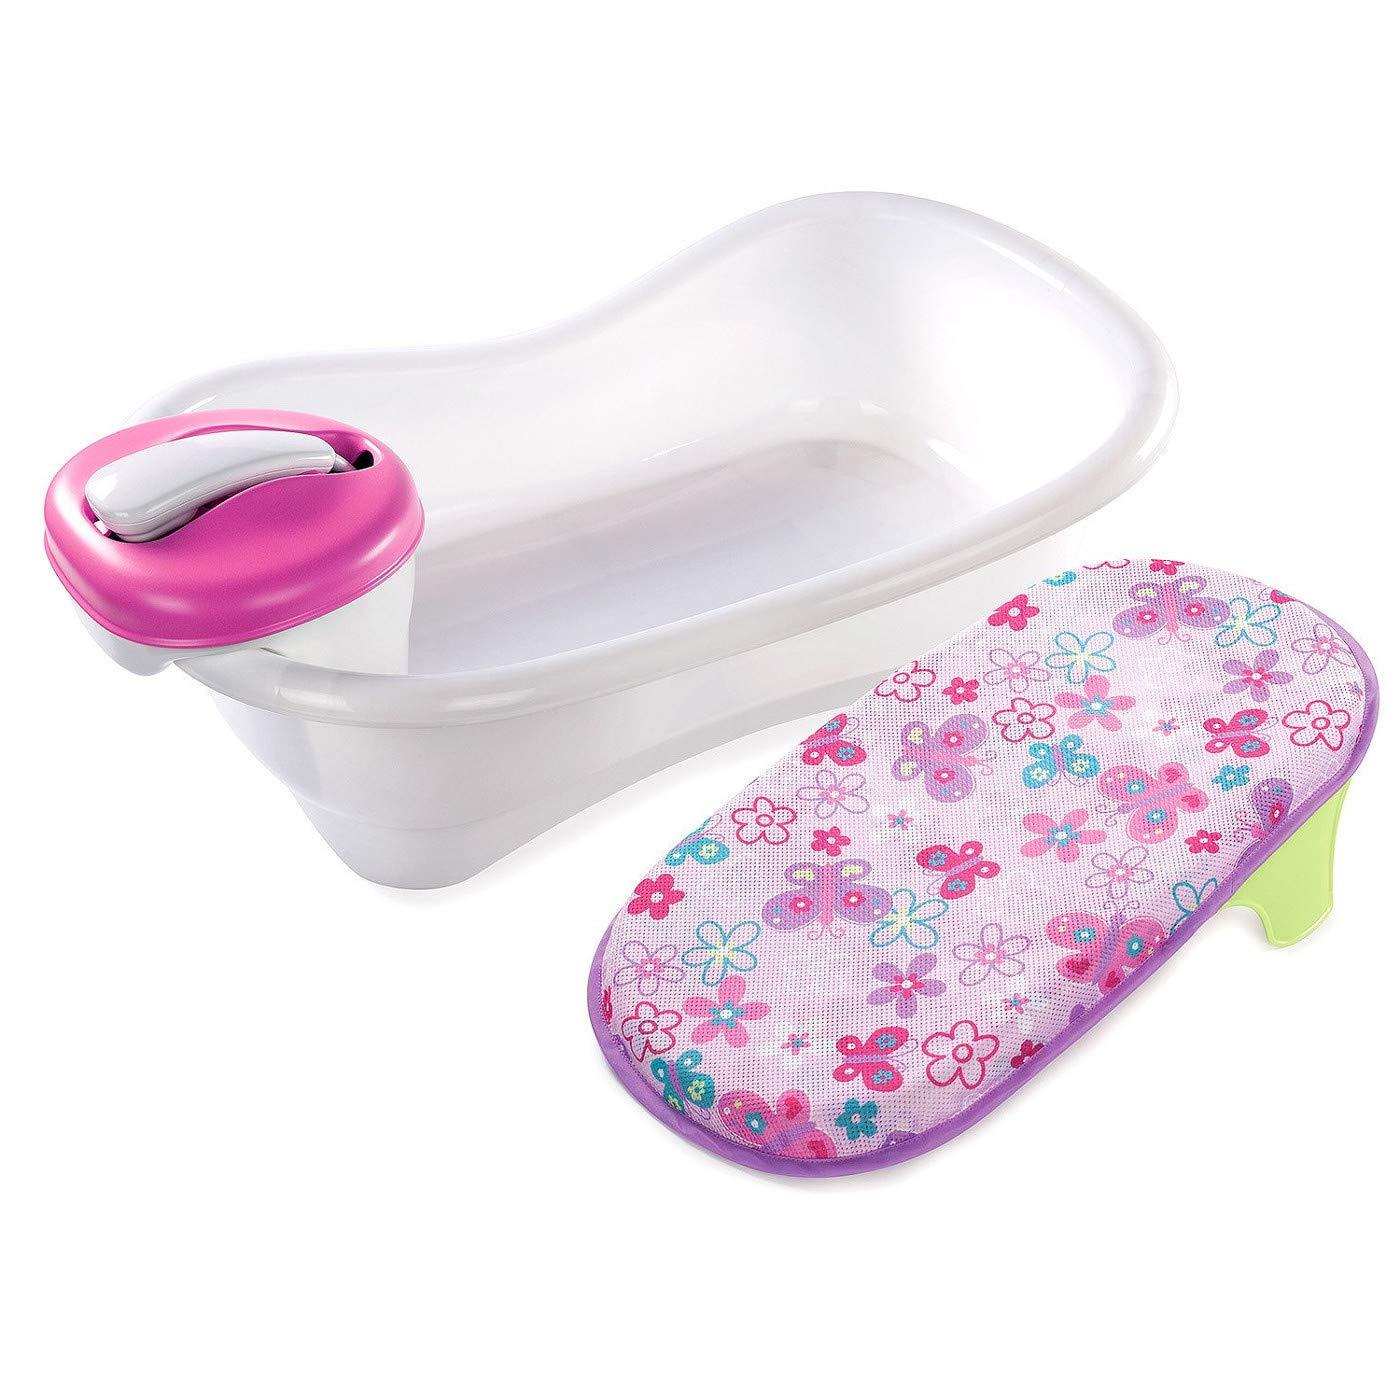 Newborn Bath Center Newborn Bathing Suit Bathing Bath Support Toddler Tub Motorized Shower Kit Set & E Book by Easy2Find.